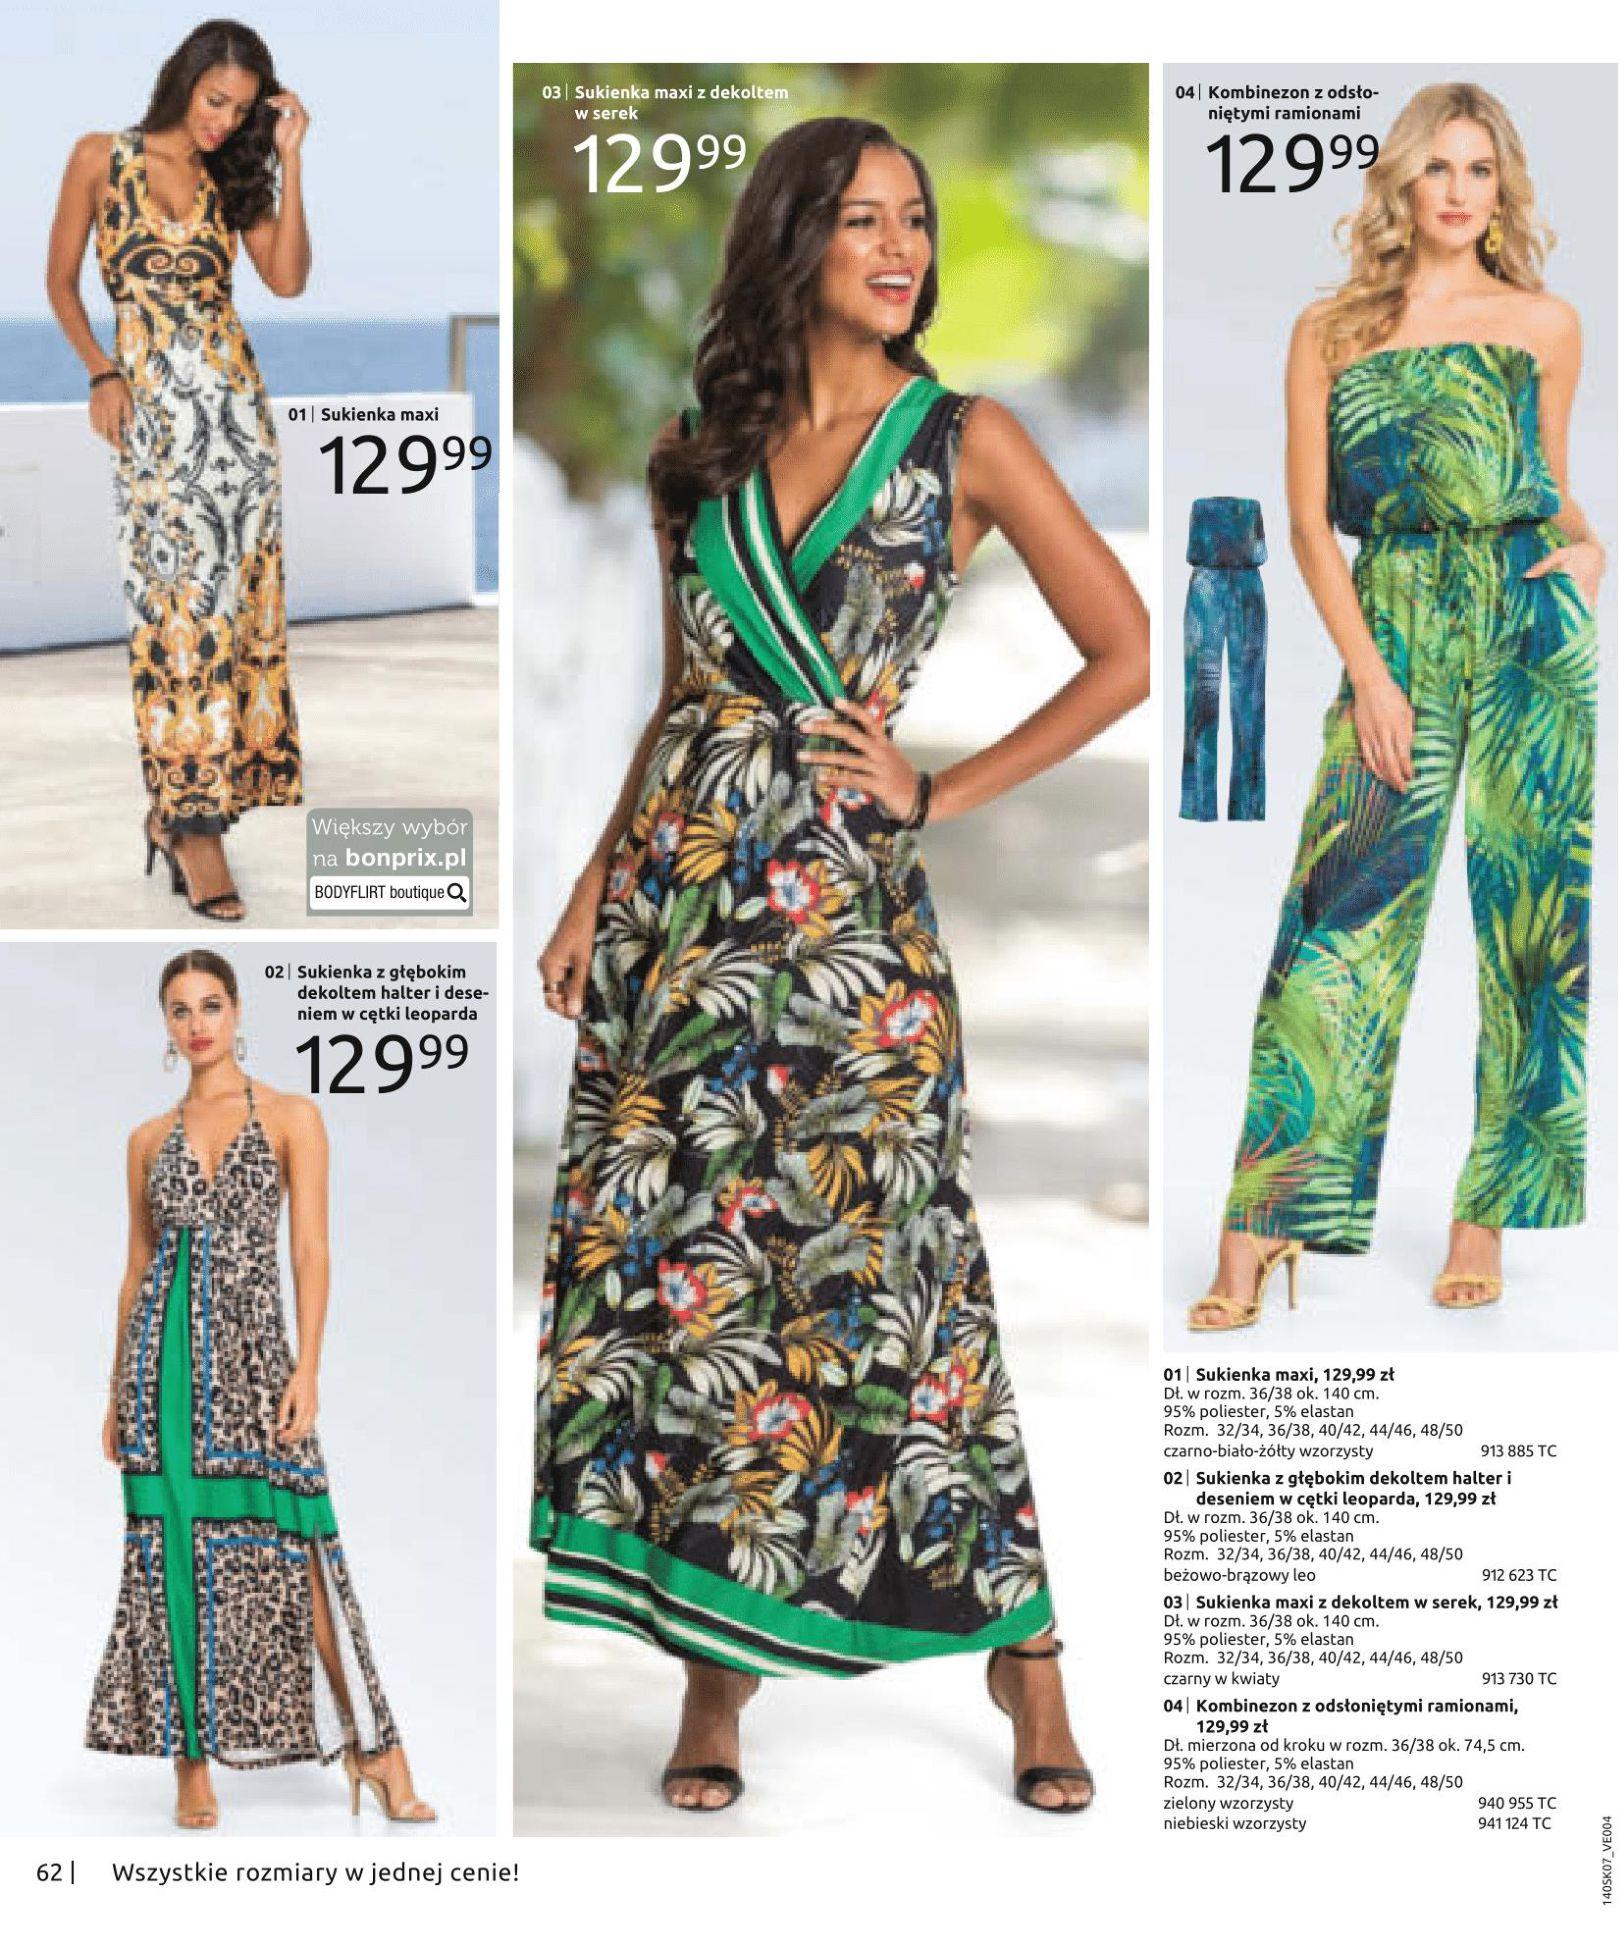 Gazetka Bonprix - Letnie trendy-02.07.2019-15.01.2020-page-64